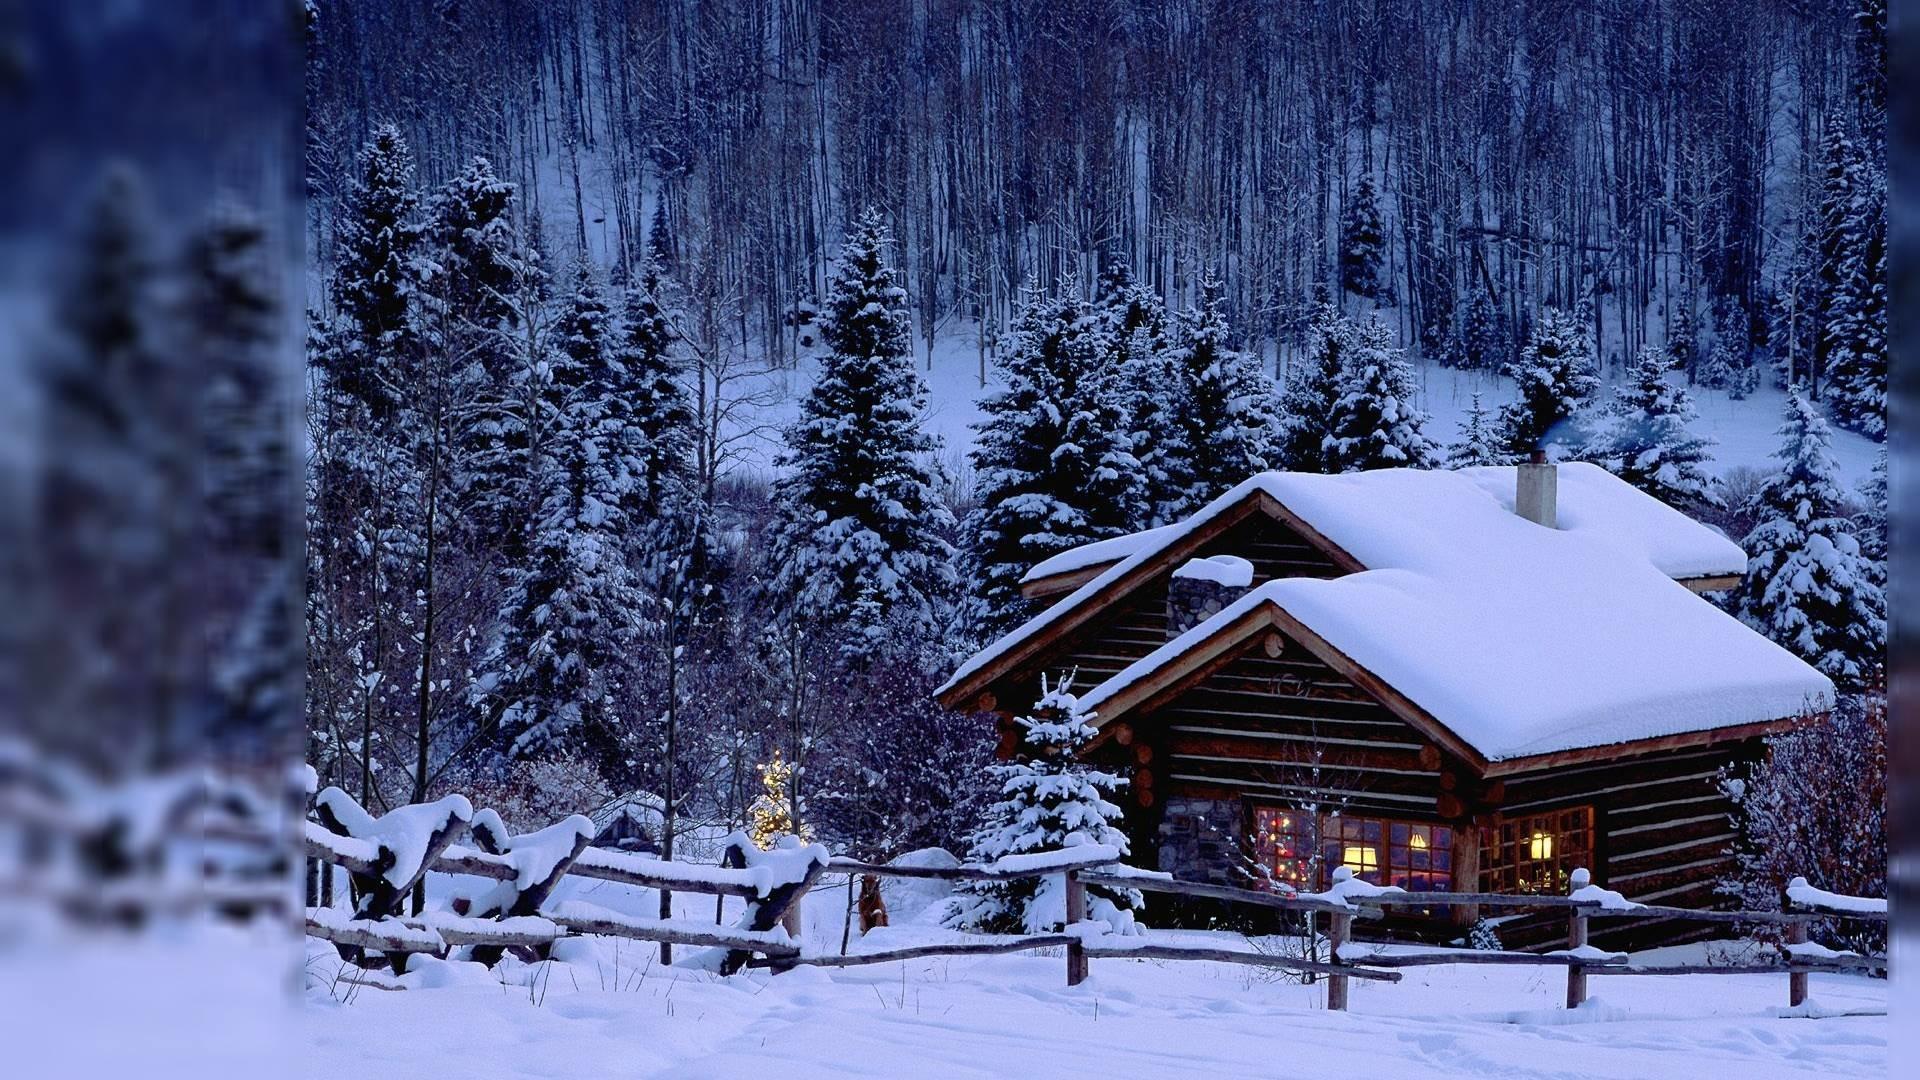 1920x1080 Full HD p Best HD Winter Wallpapers Wallpapers